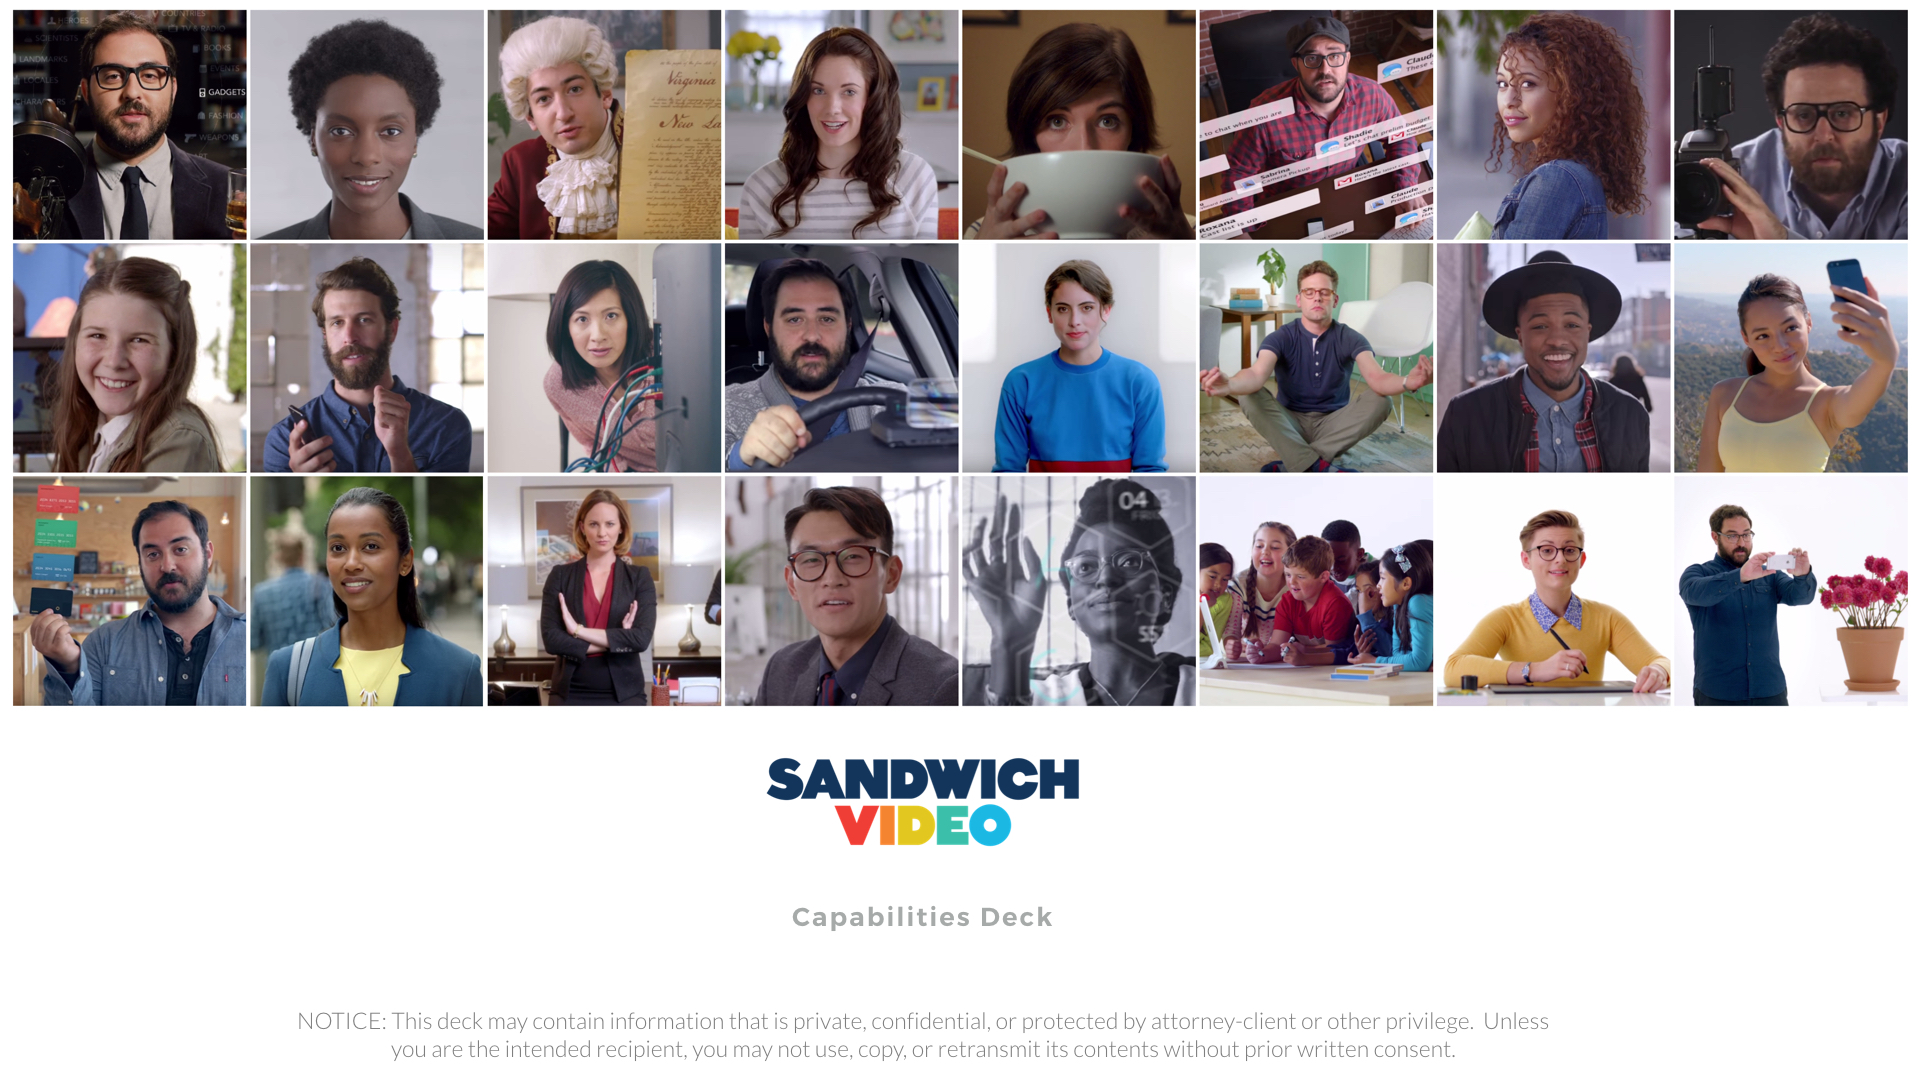 Sandwich Video Capabilities